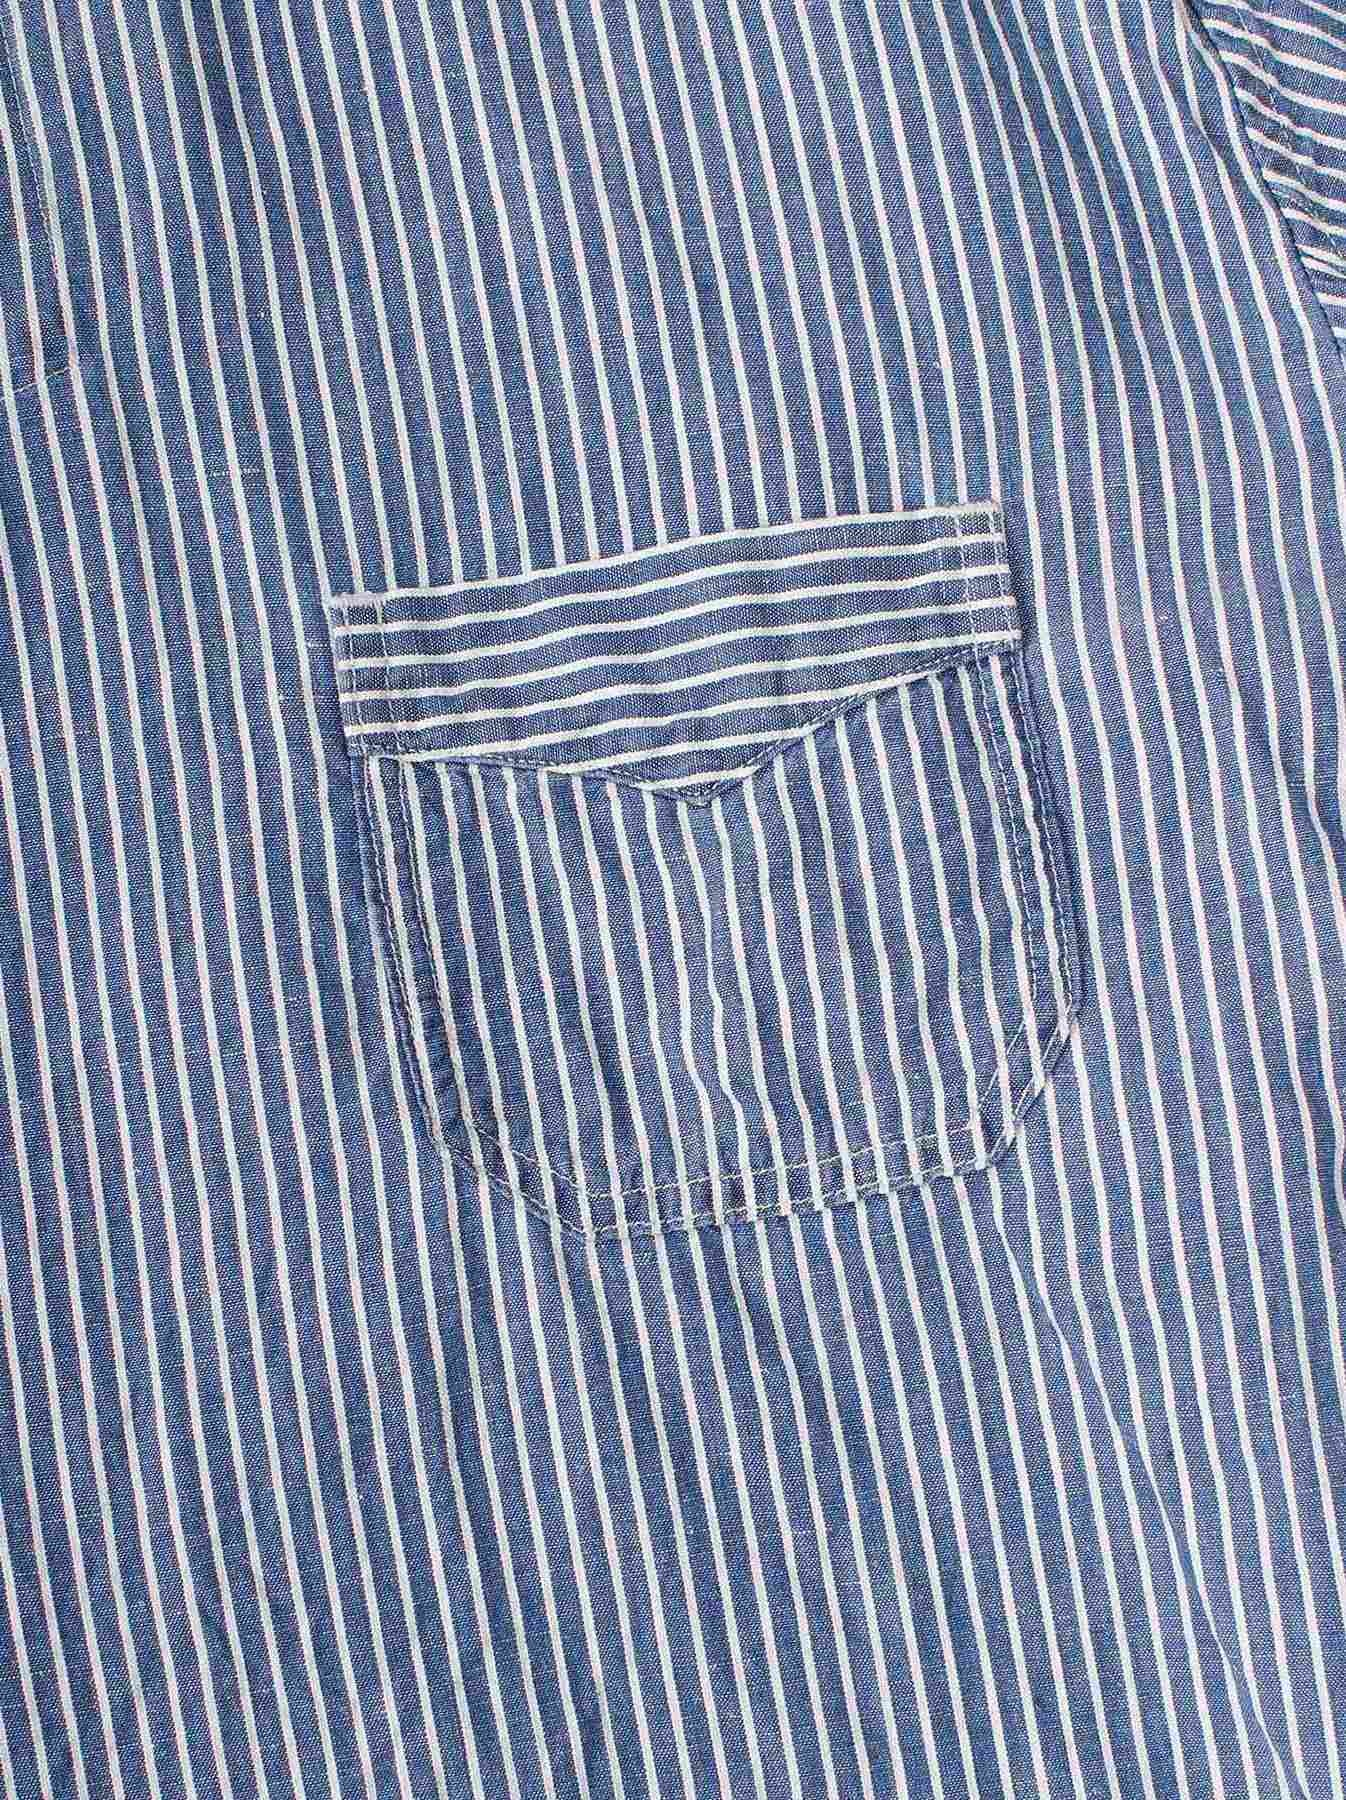 WH Cotton Linen Hickory Umahiko Pullover Shirt-7